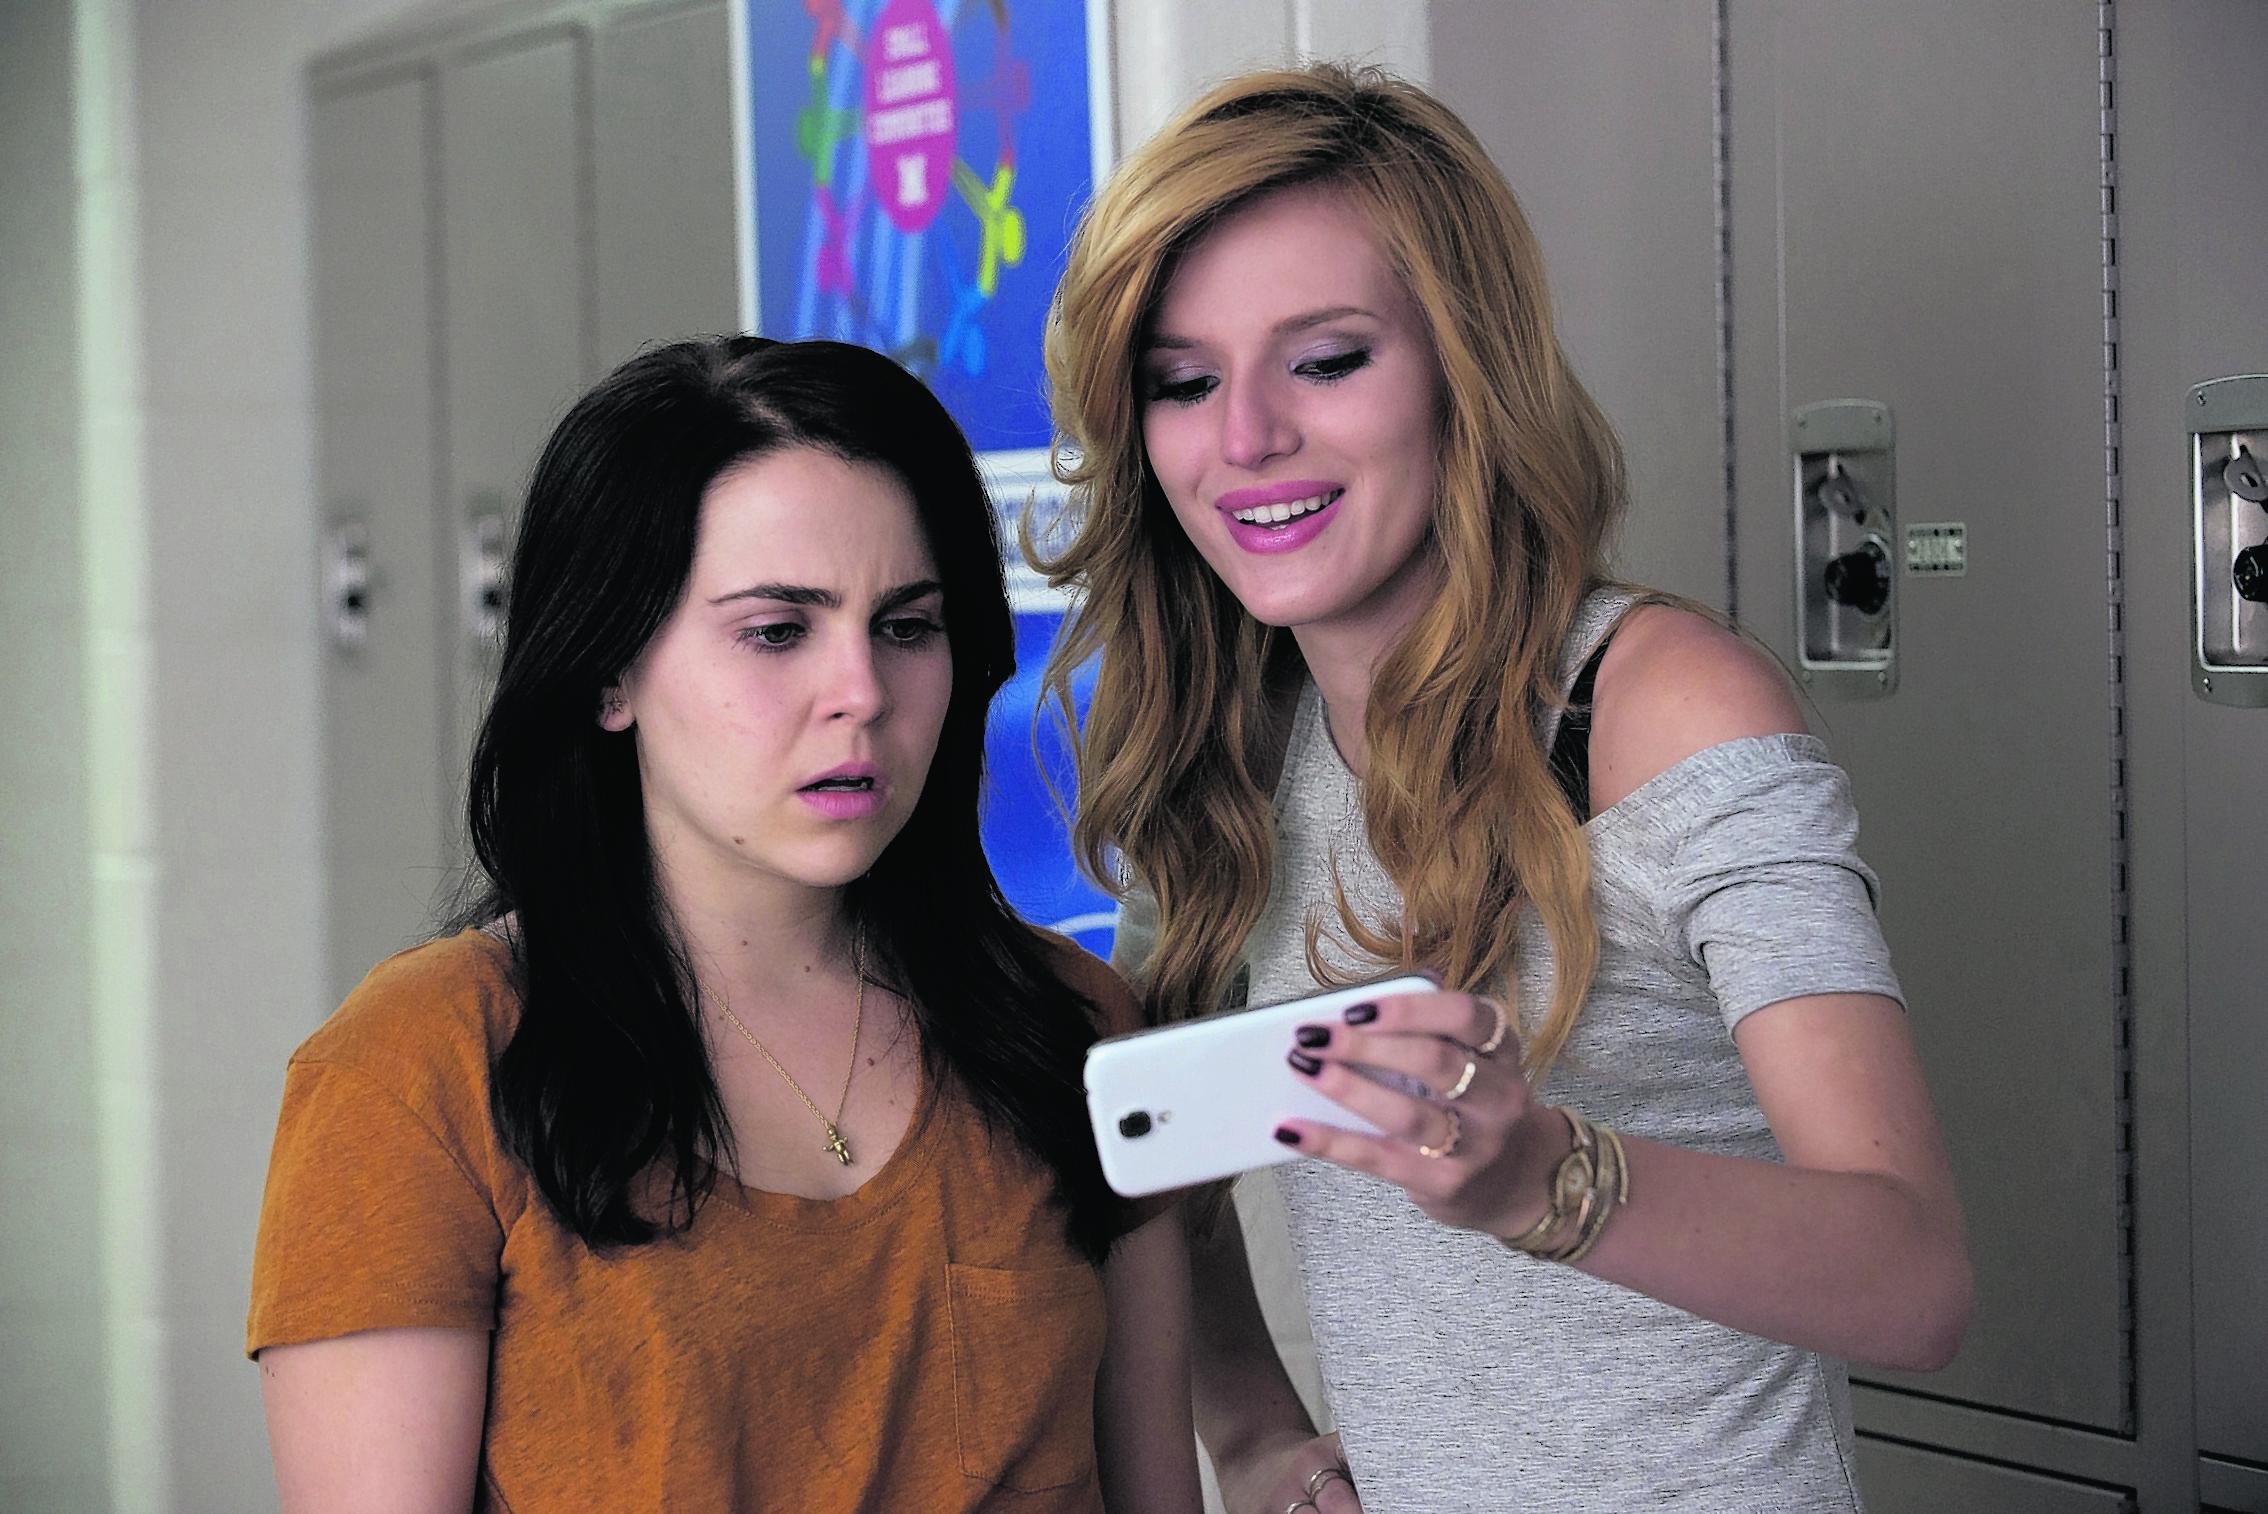 Mae Whitman as Bianca Piper and Bella Thorne as Madison Morgan.